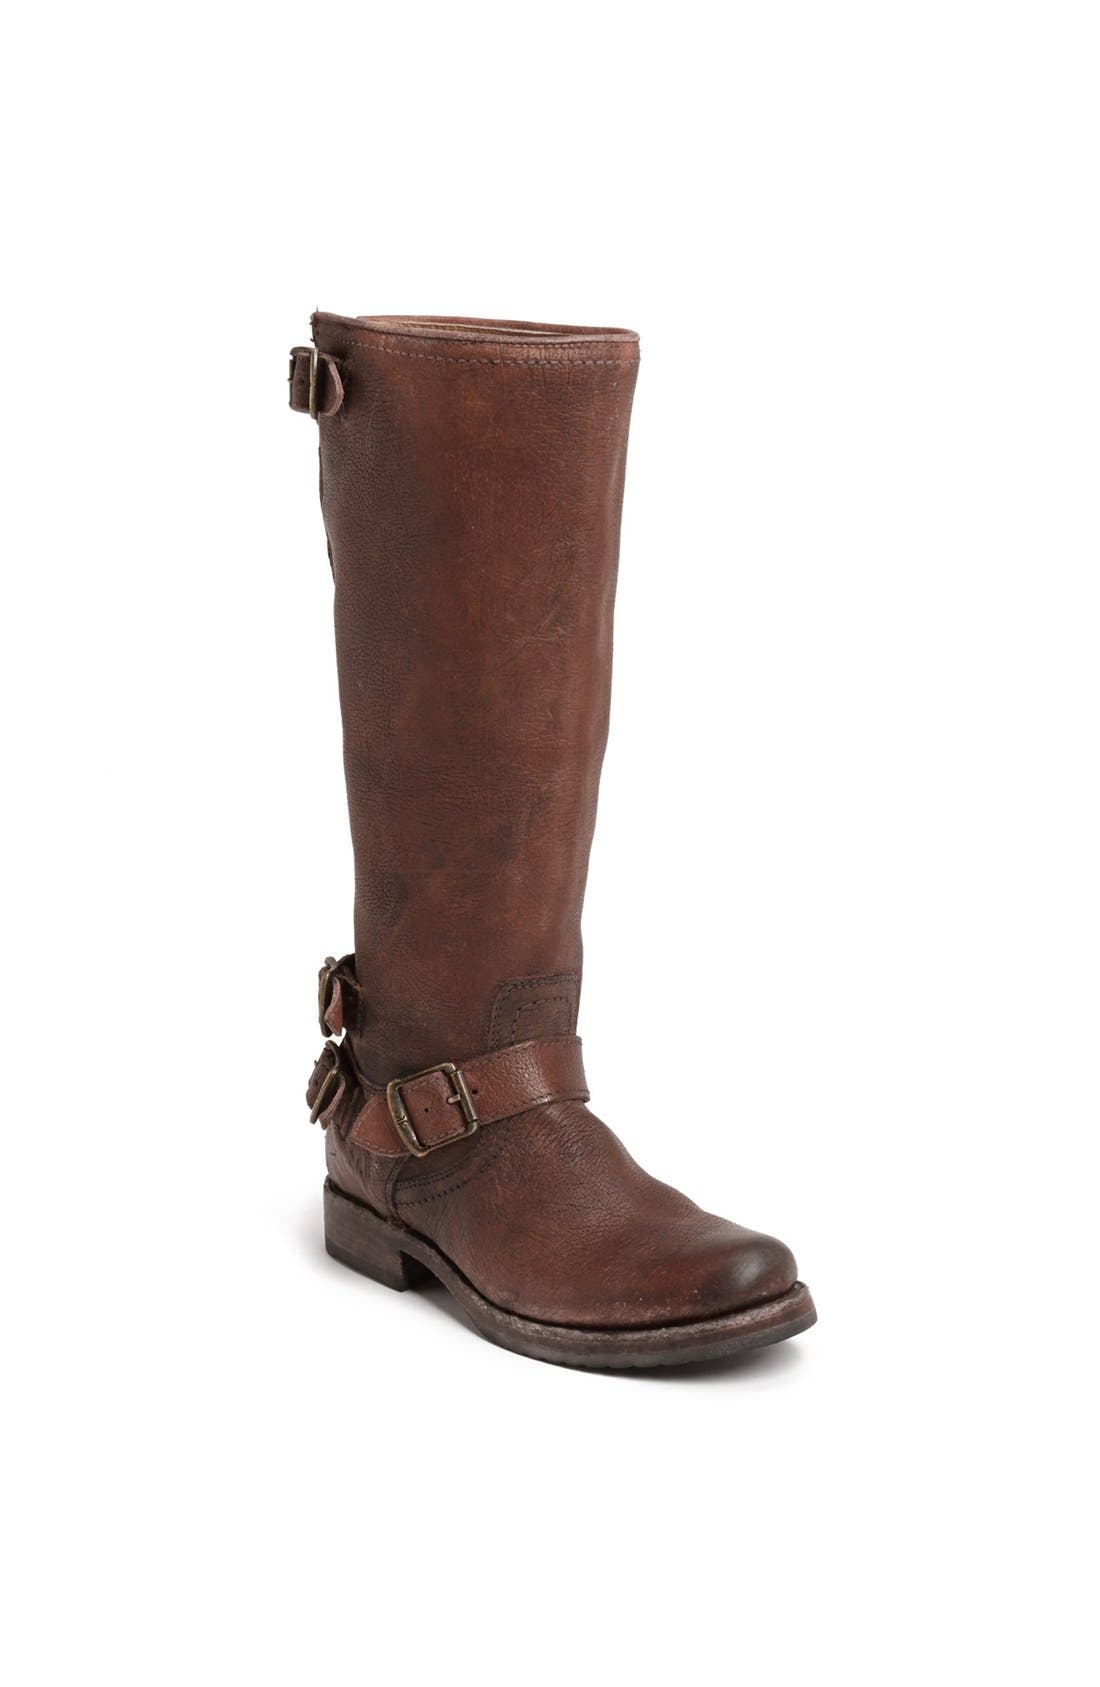 Main Image - Frye 'Veronica Back Zip' Boot